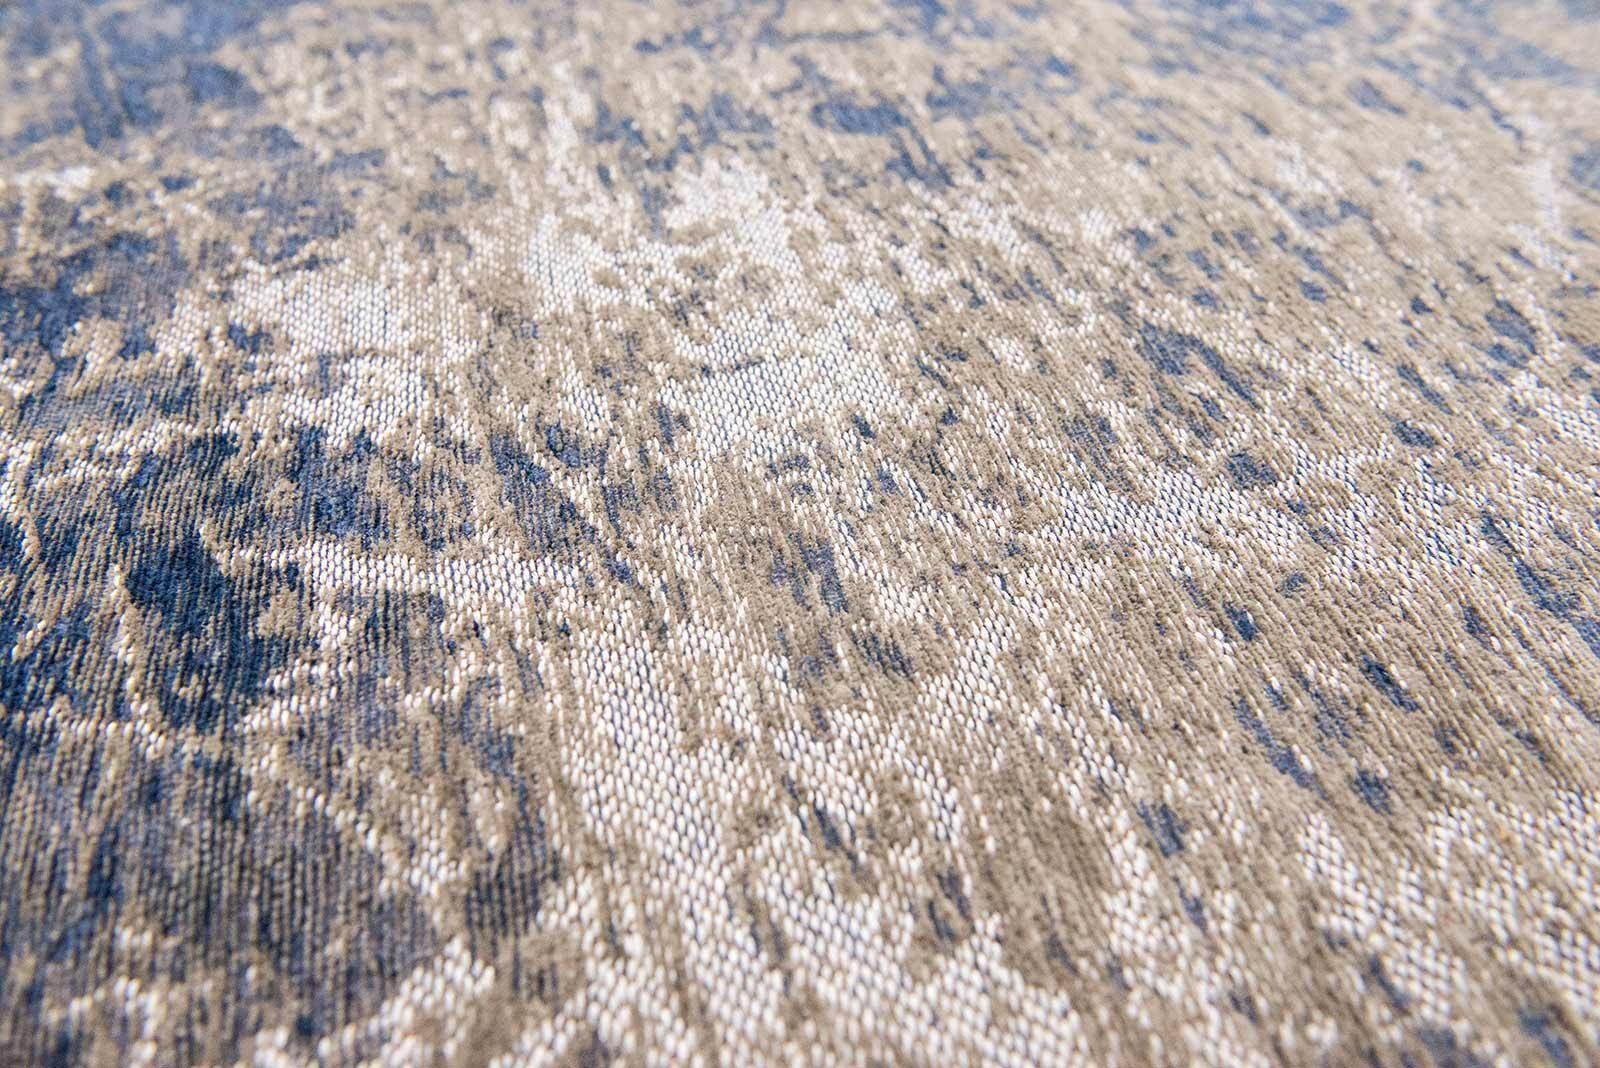 rugs Louis De Poortere LX8629 Mad Men Cracks Abyss Blue zoom 2